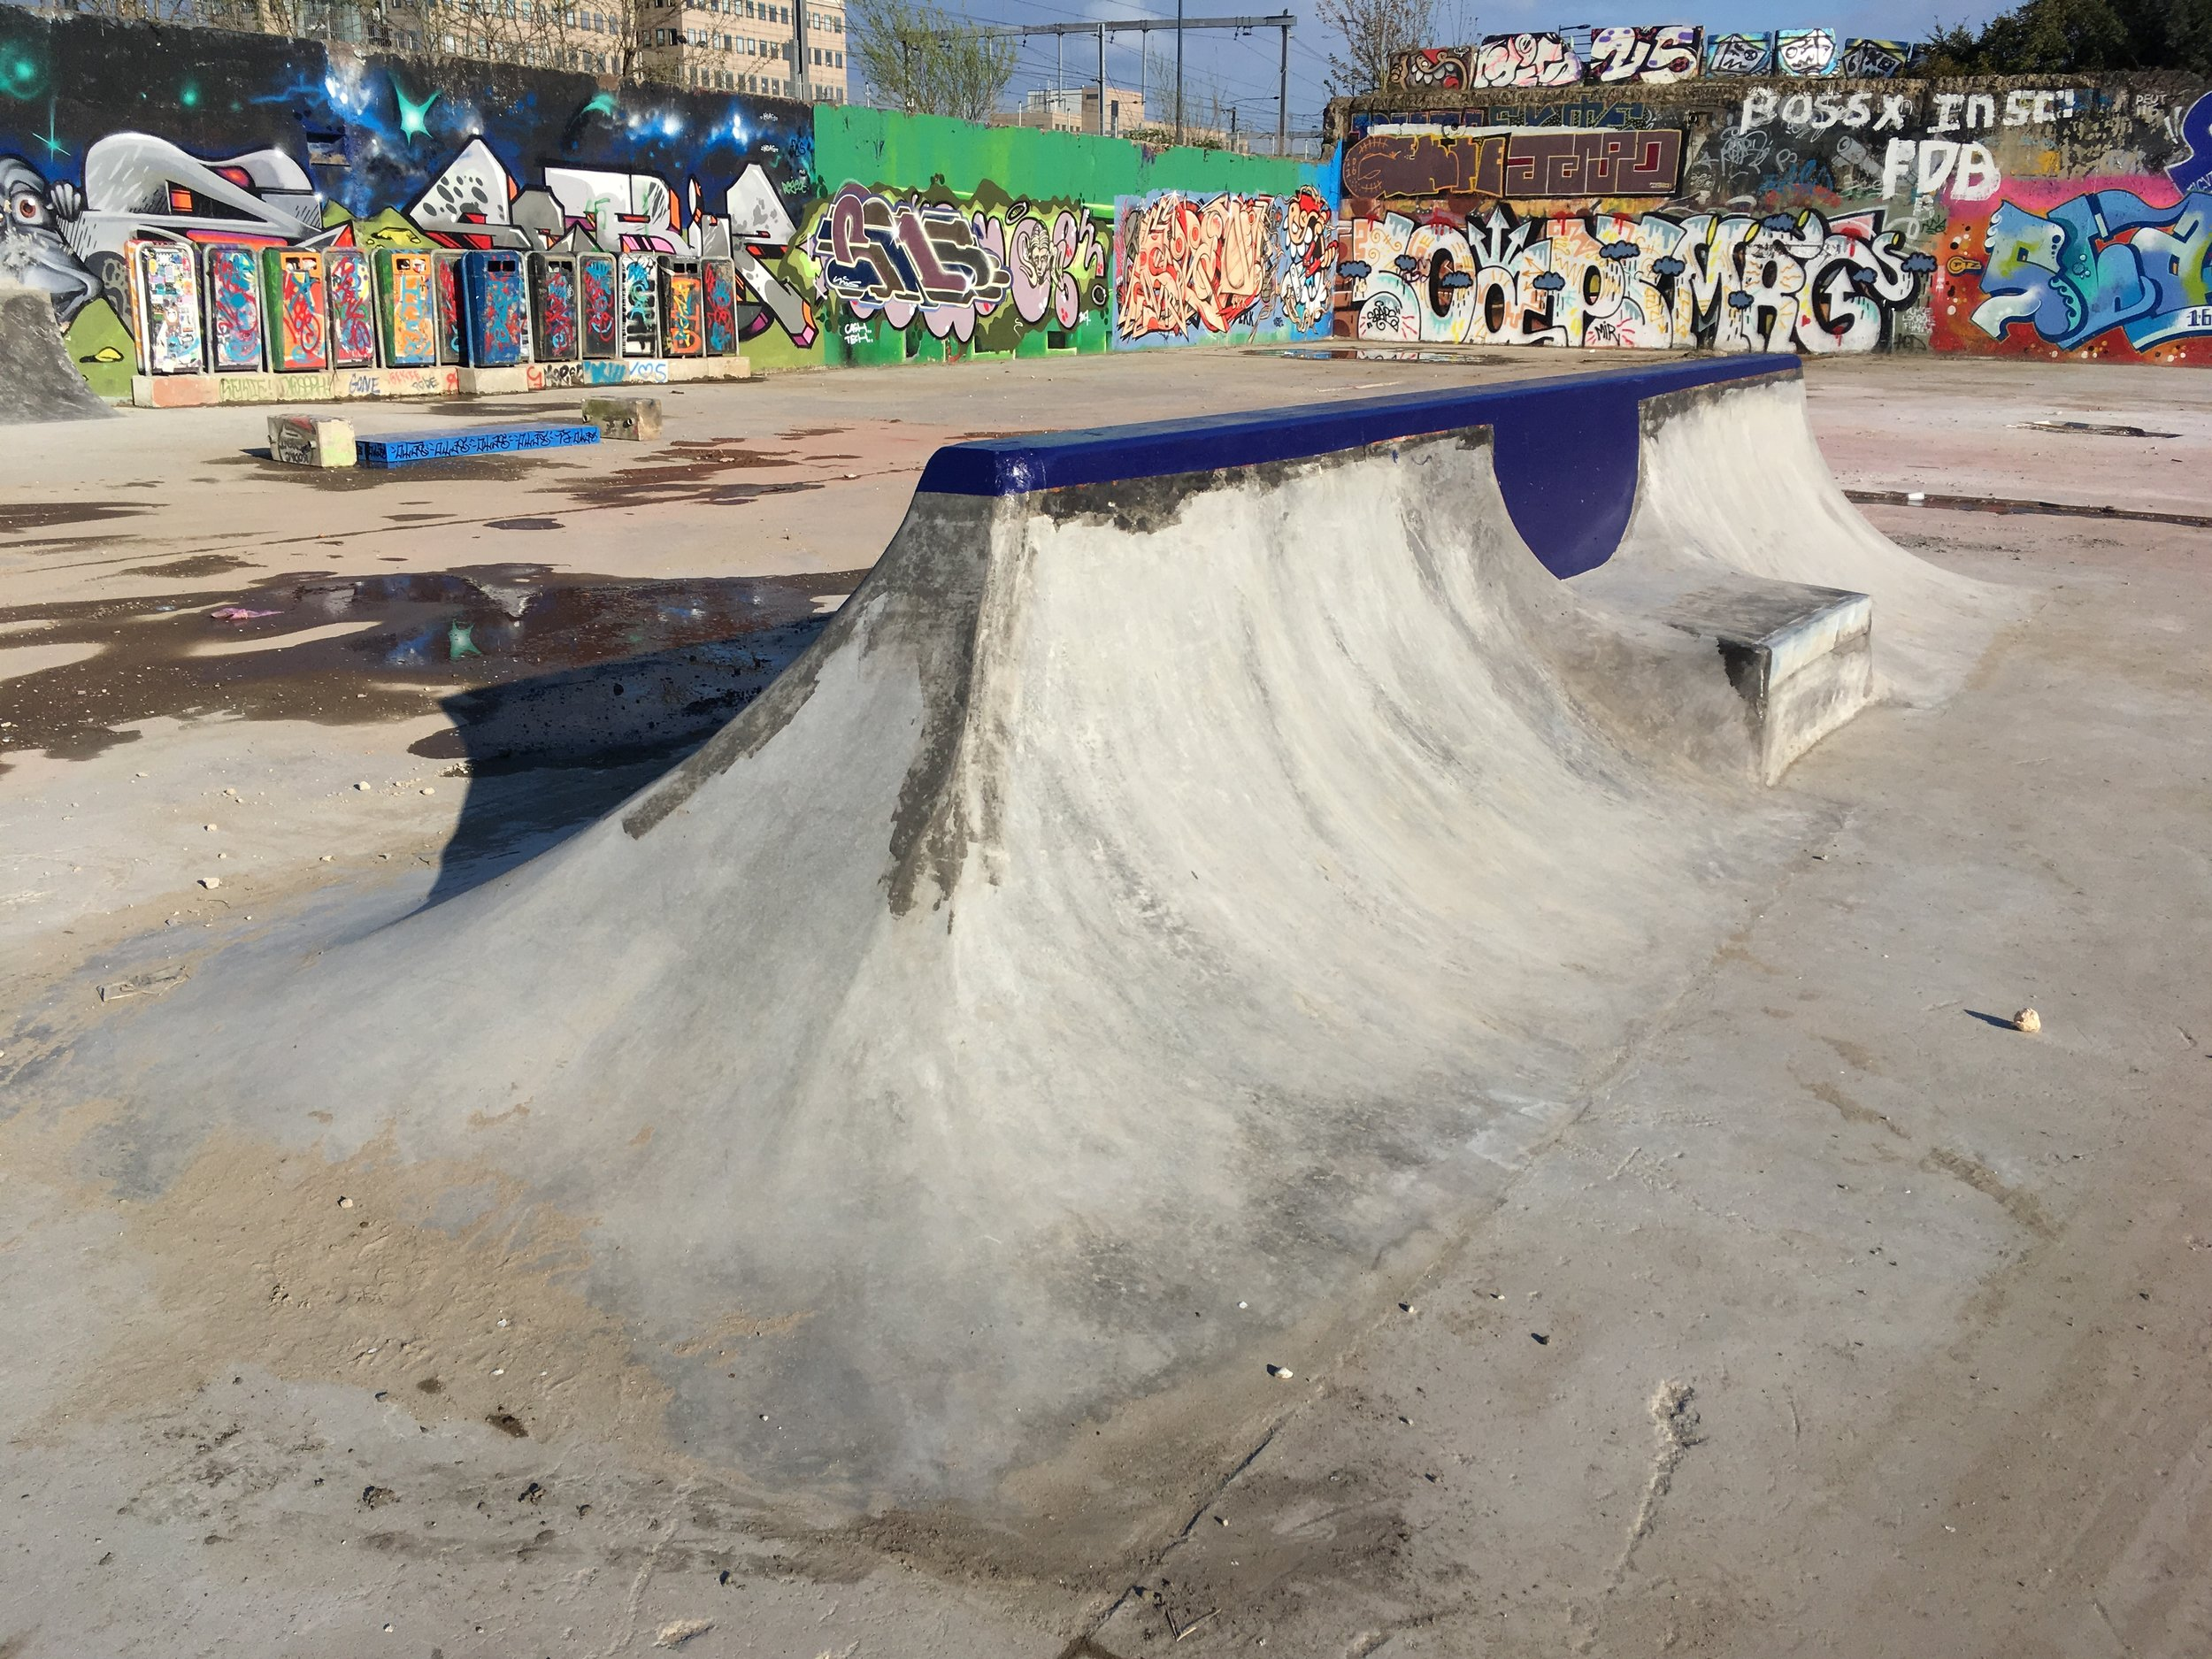 Spine Skatespot Yard